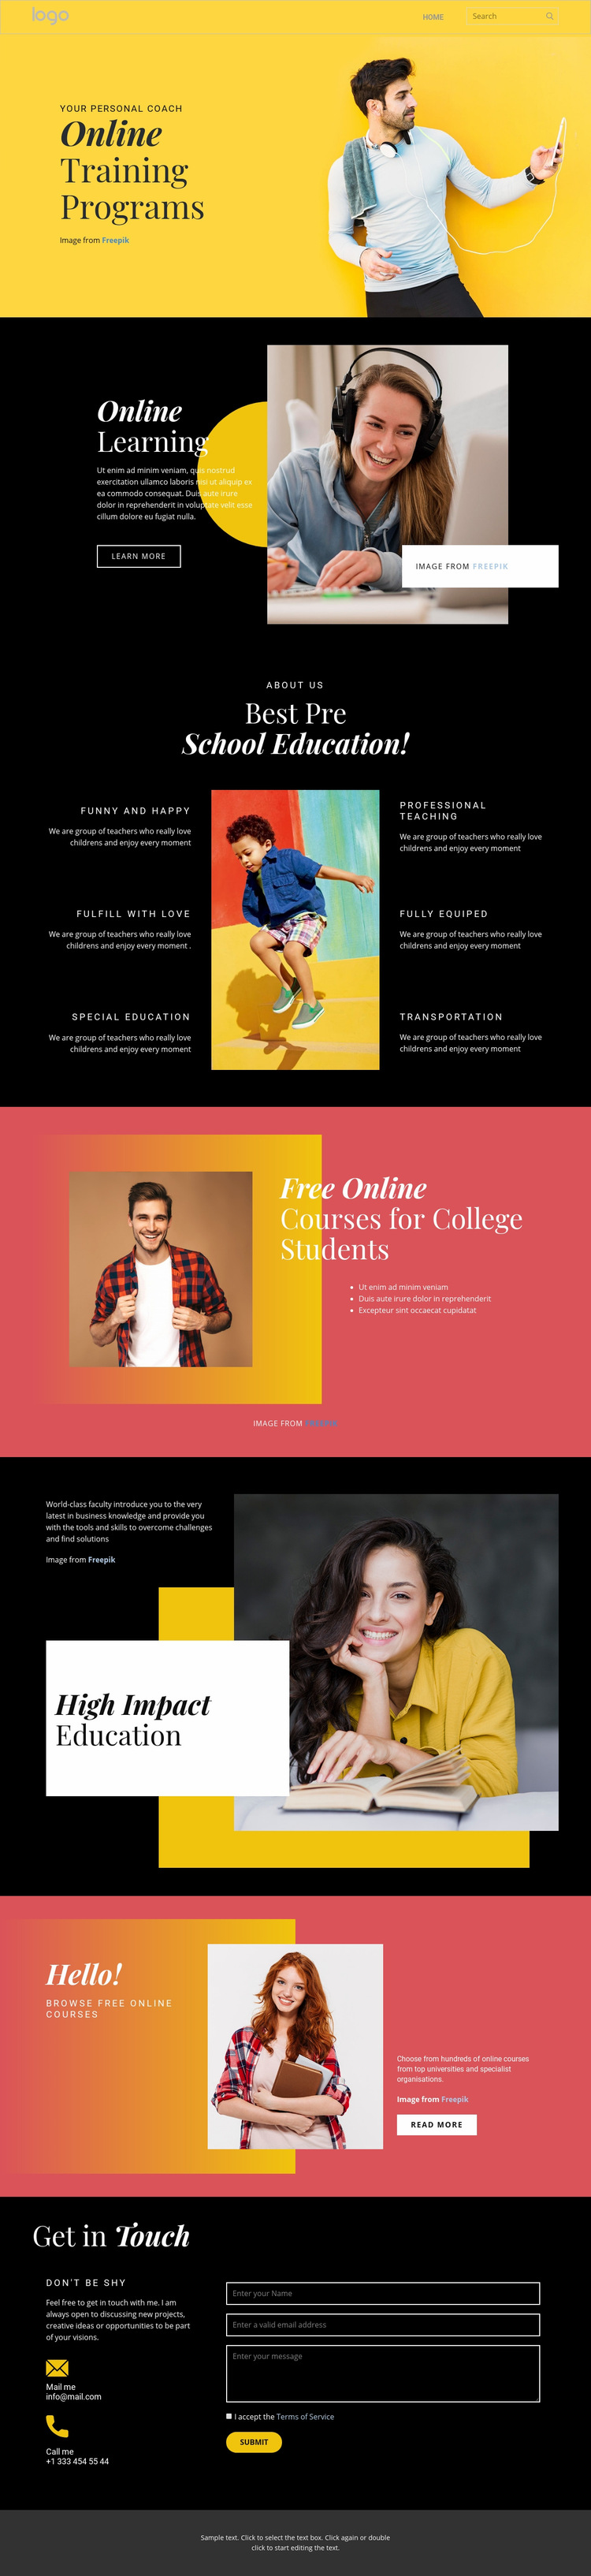 Good online education Web Page Design